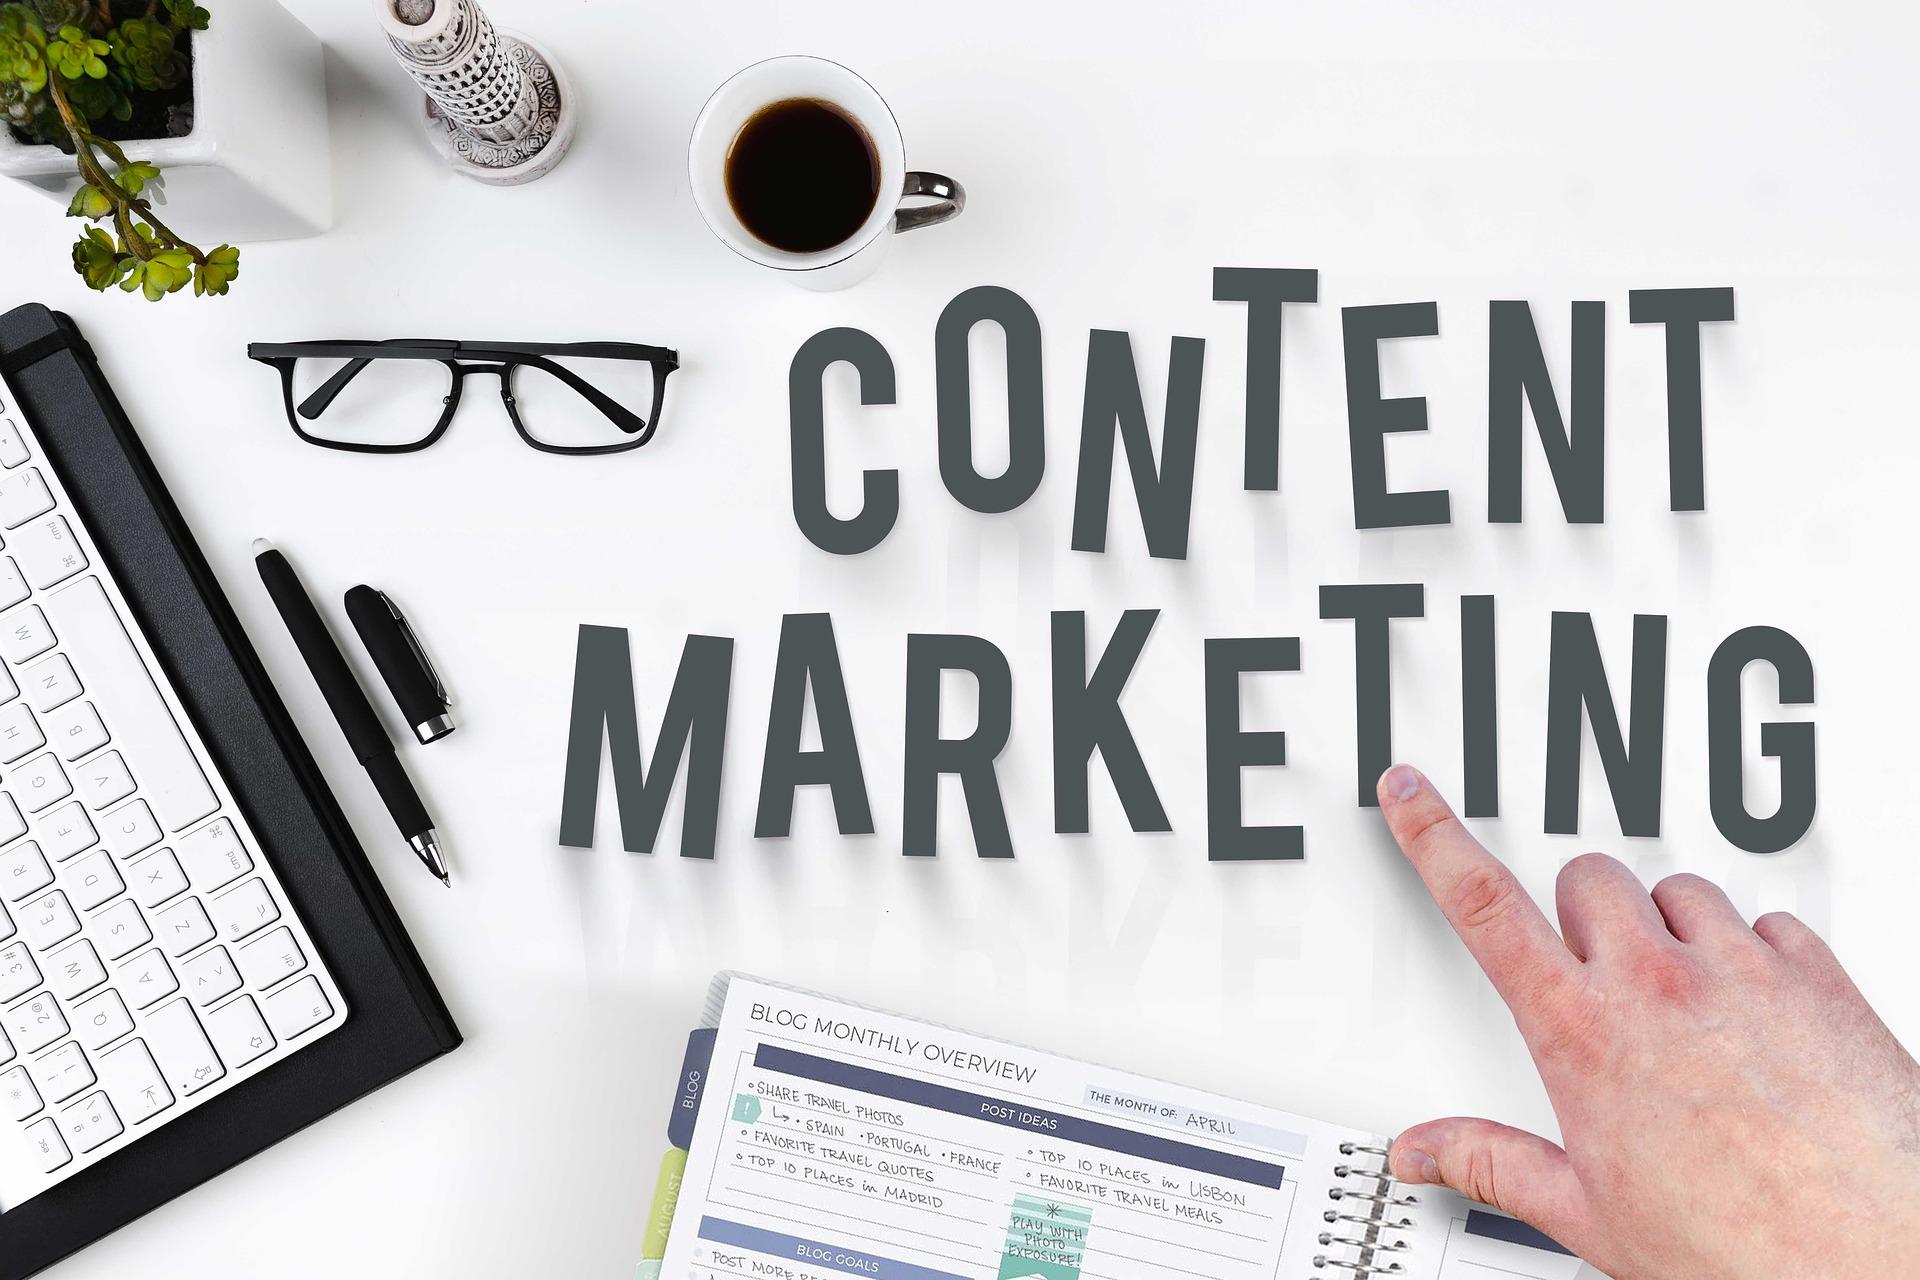 content marketing for interior designers